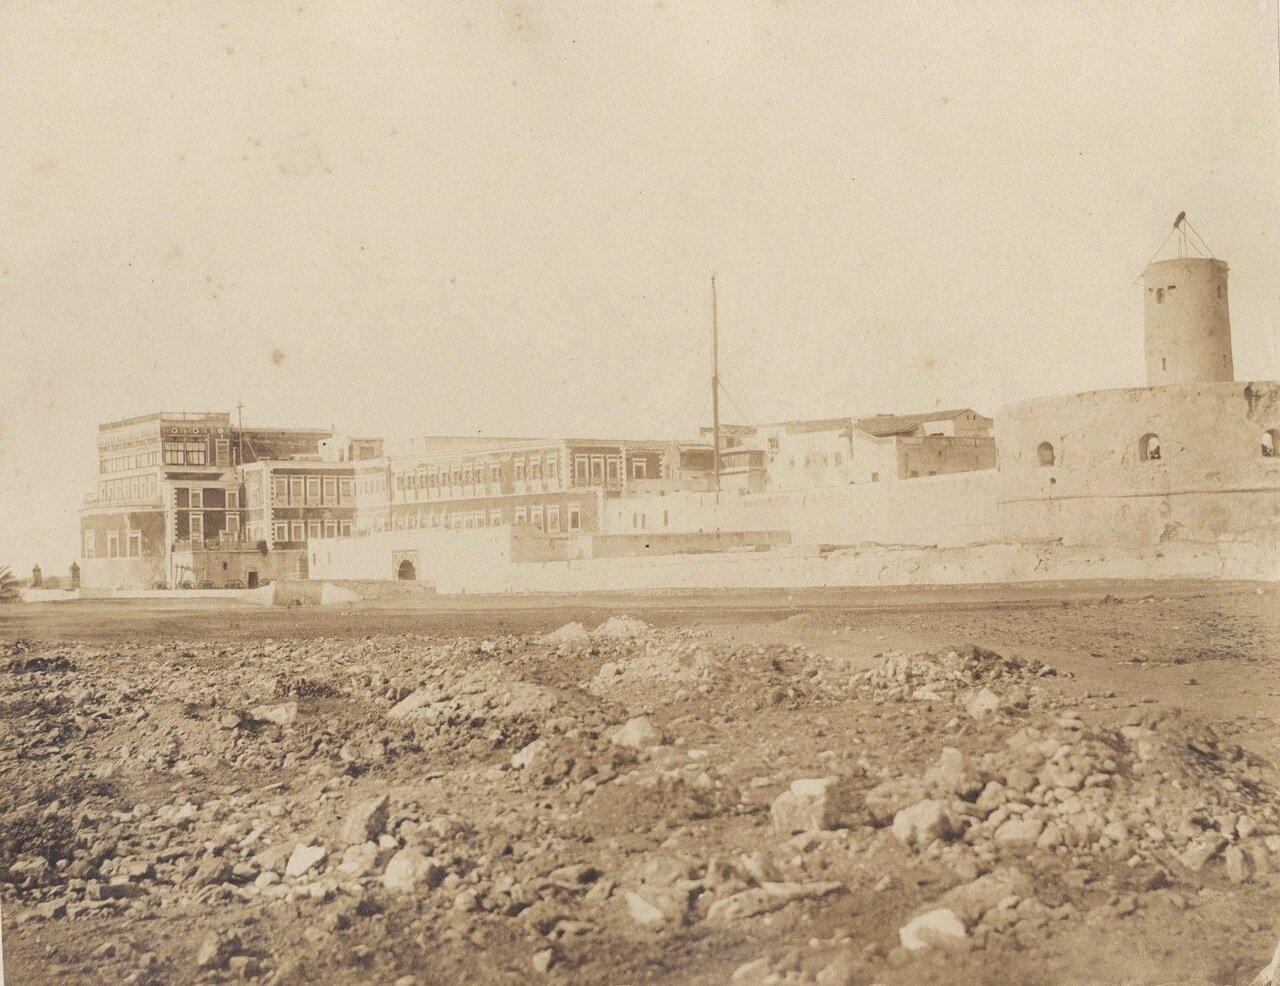 1856-1857. Без подписи (фотограф Феликс-Жак-Антуан Мулен)